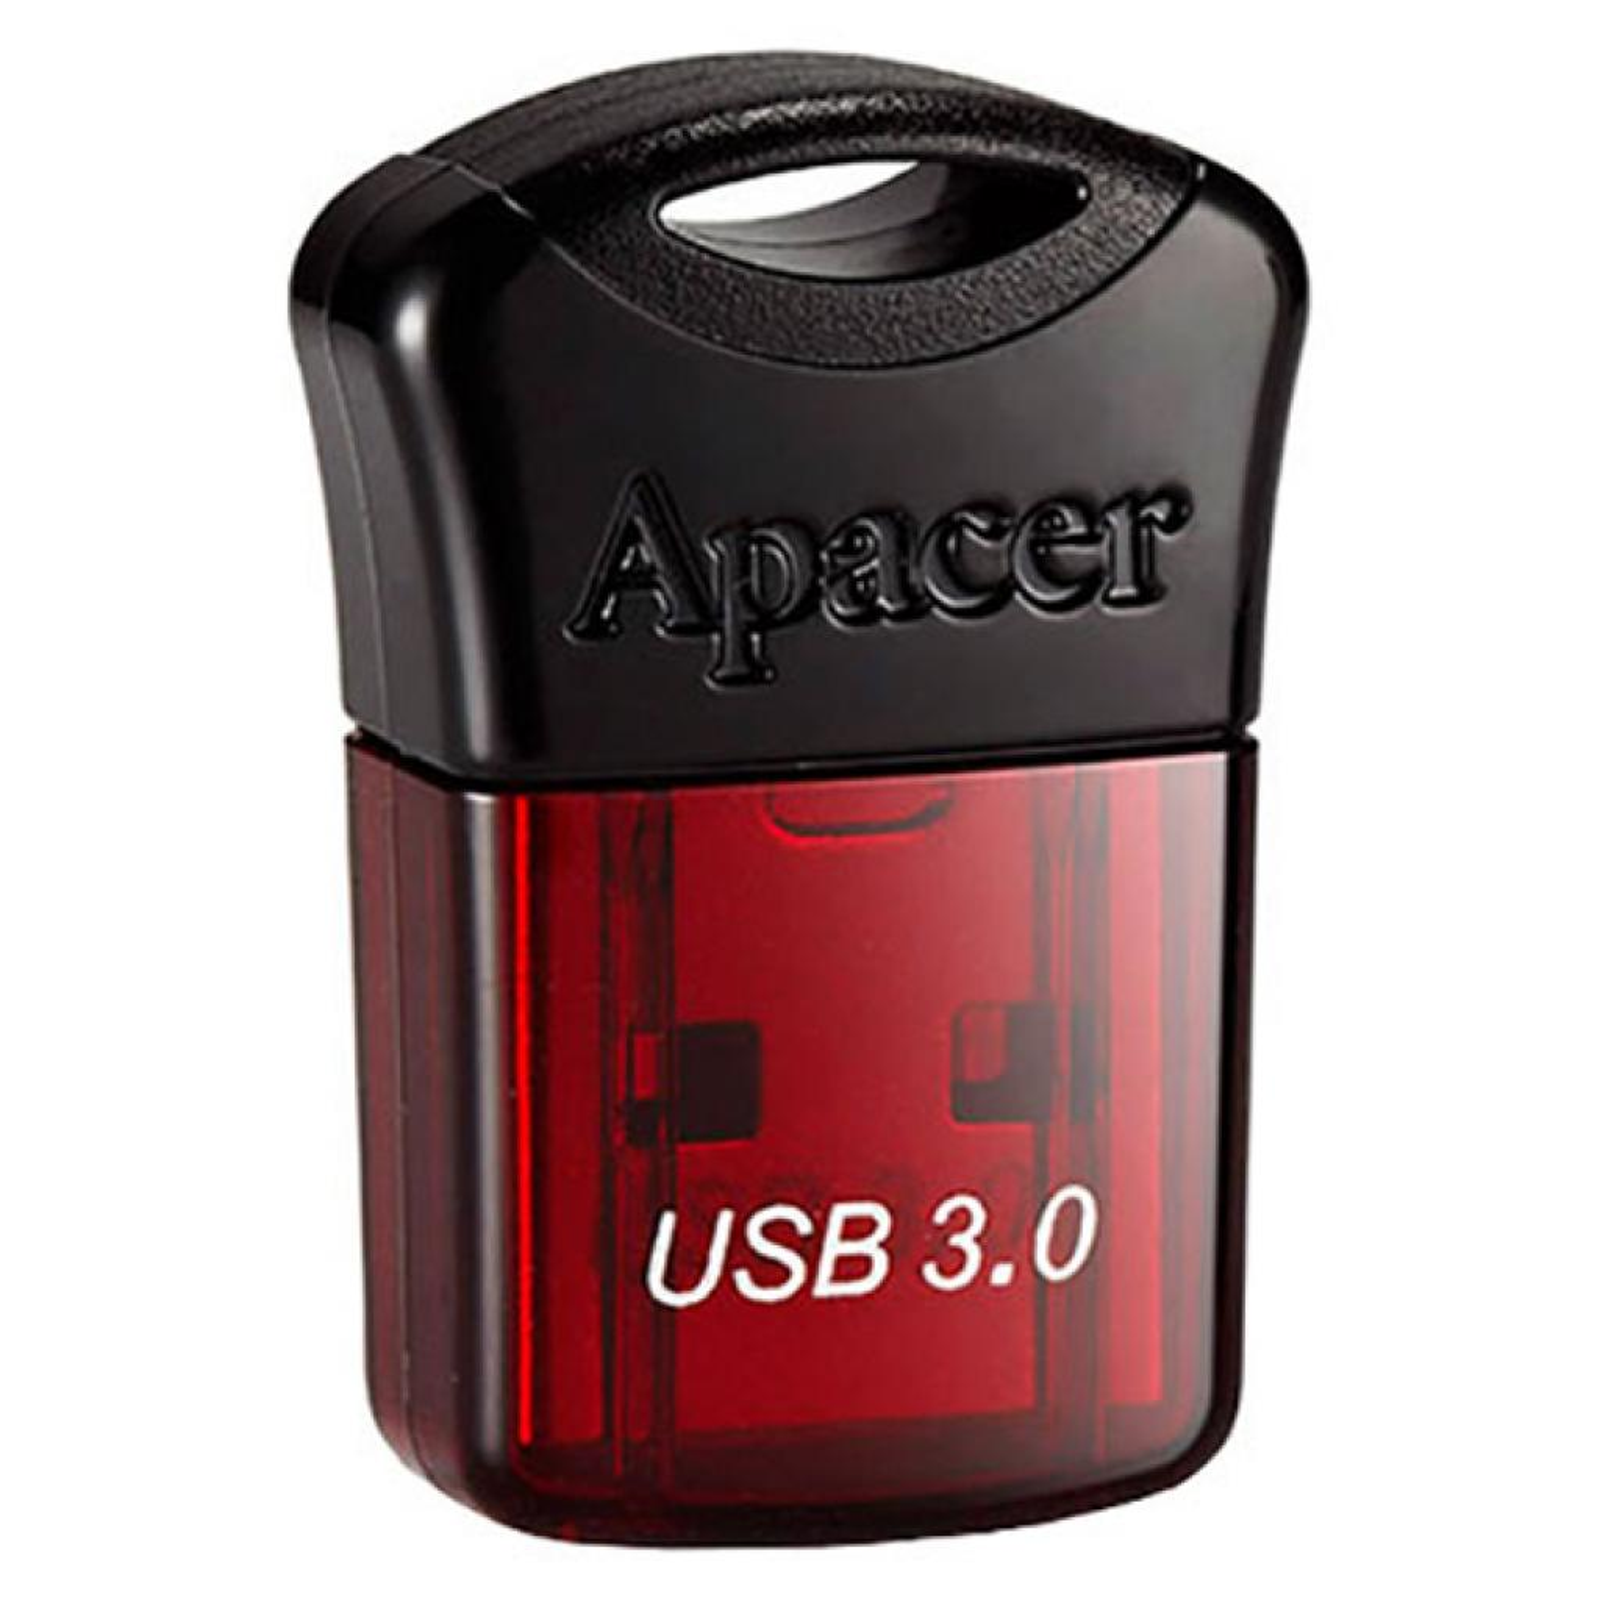 USB флеш накопитель Apacer 8GB AH157 Red USB 3.0 (AP8GAH157R-1) изображение 2